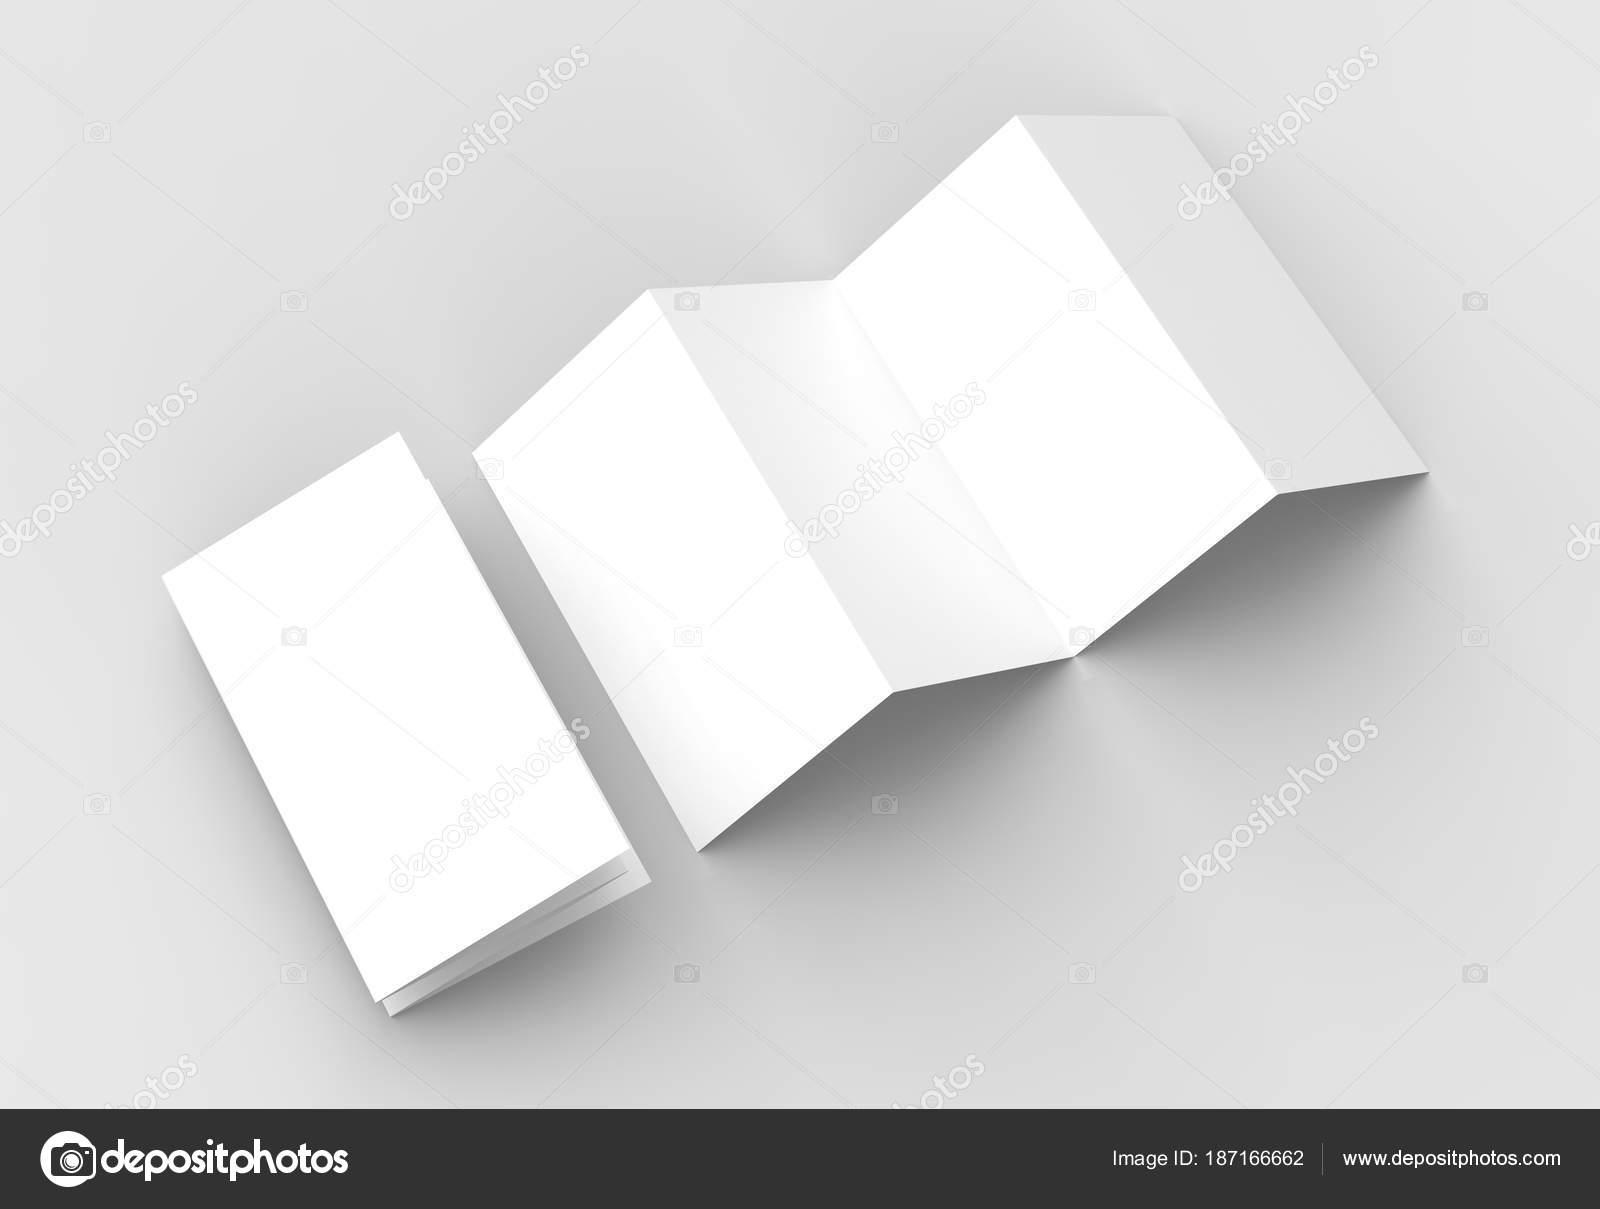 8 page leaflet 4 panel accordion fold vertical brochure mock up